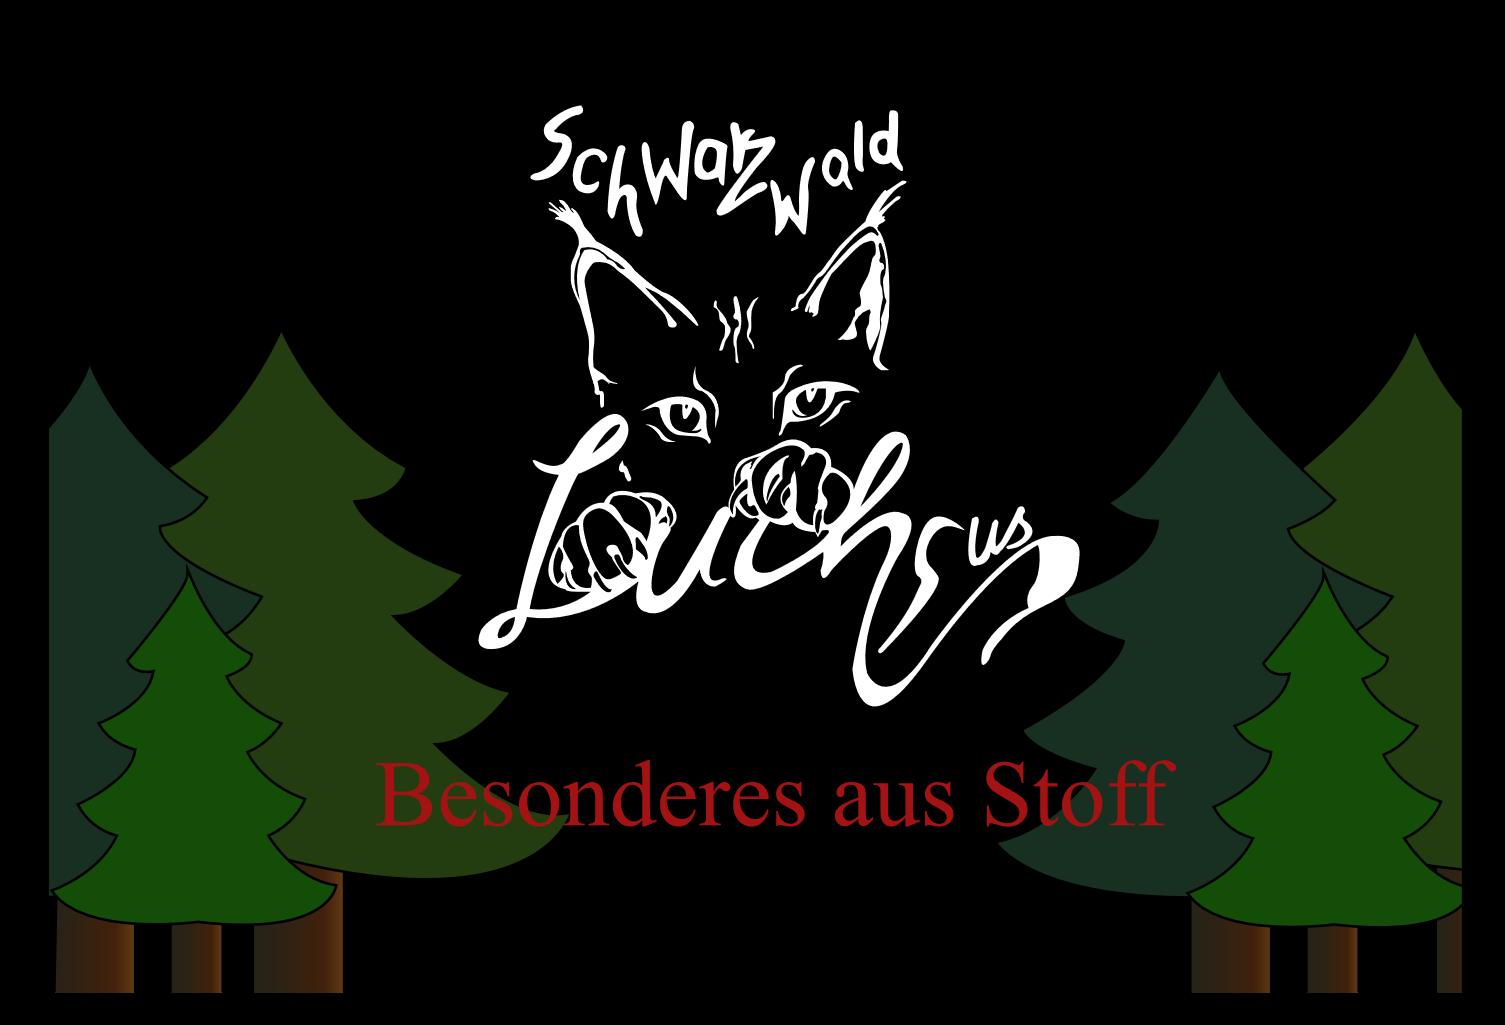 Schwarzwald-Luchsus - Alexandra Borrmann